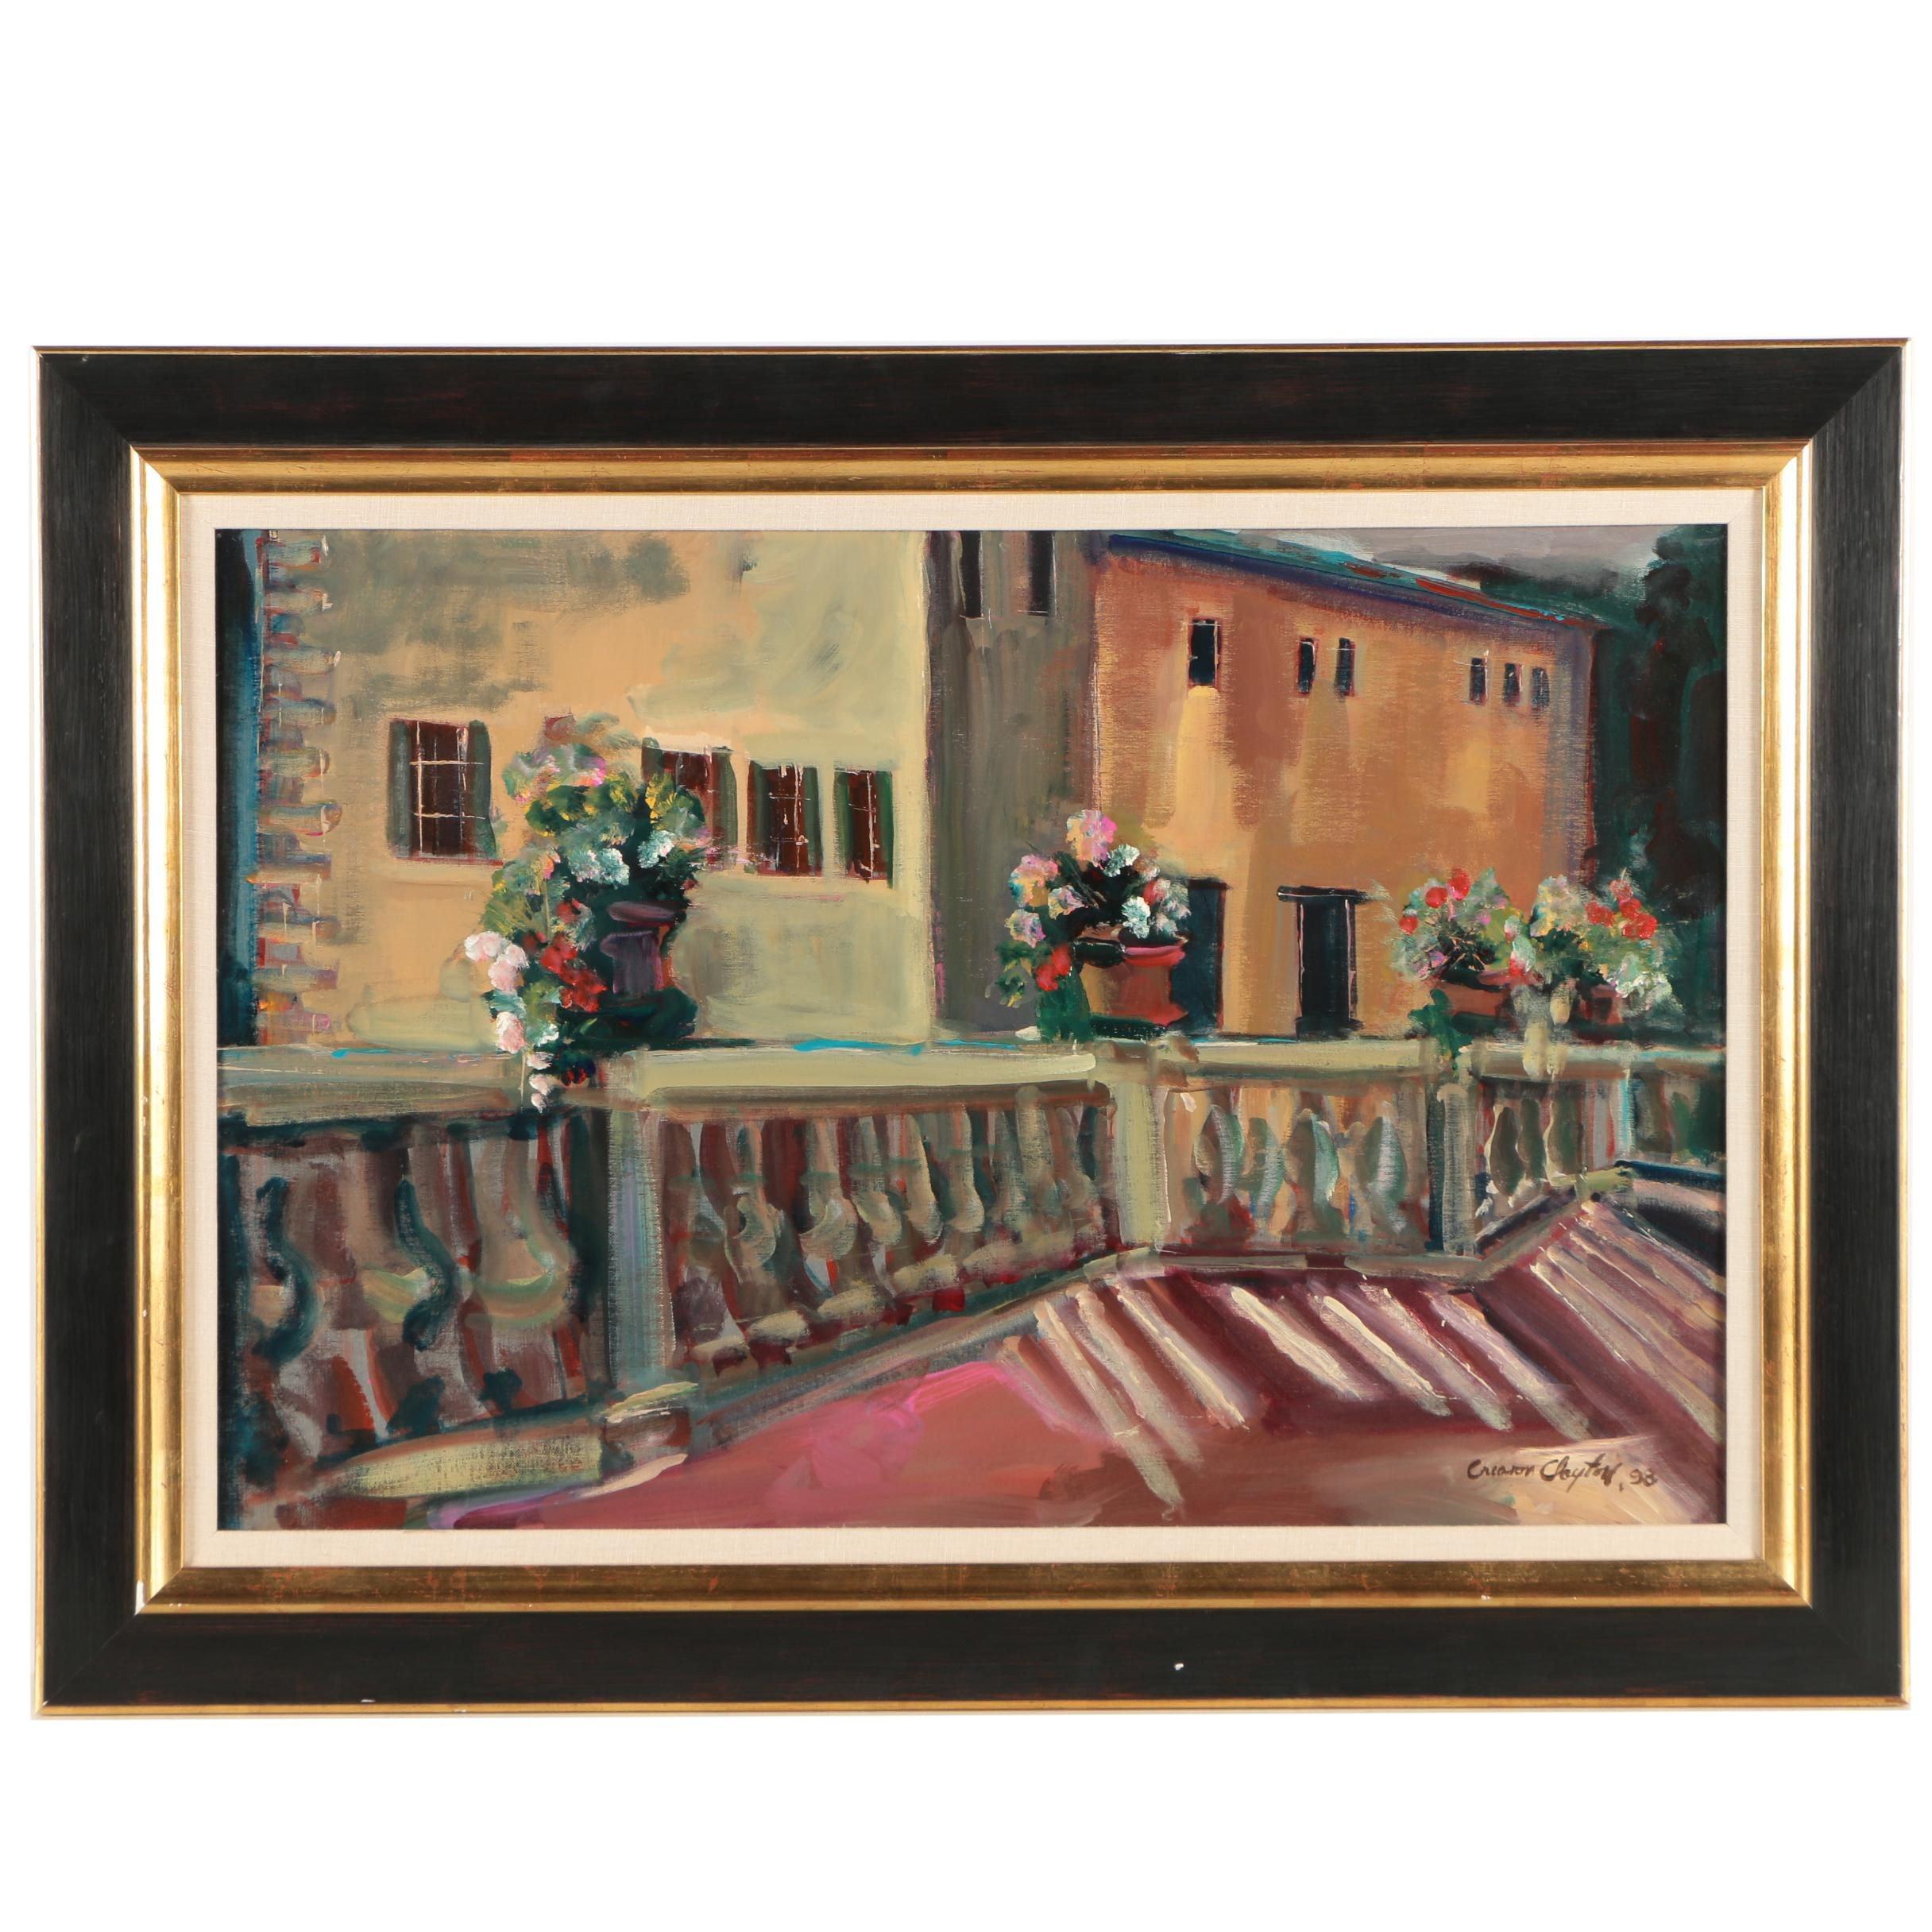 "Creason Clayton Oil Painting ""Balcony in Chianti"""